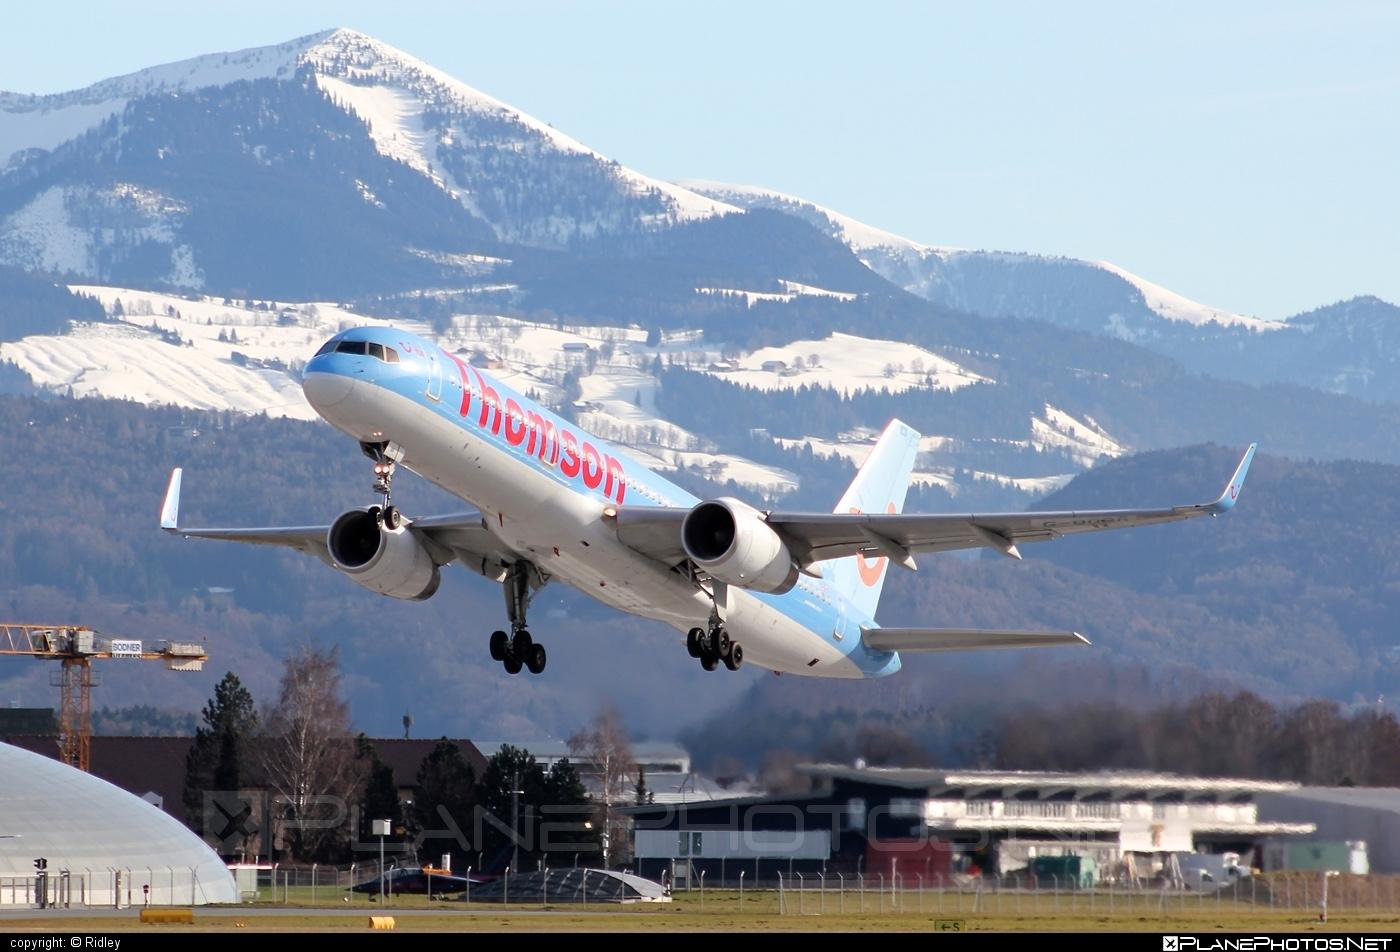 Boeing 757-200 - G-OOBR operated by Thomson Airways #b757 #boeing #boeing757